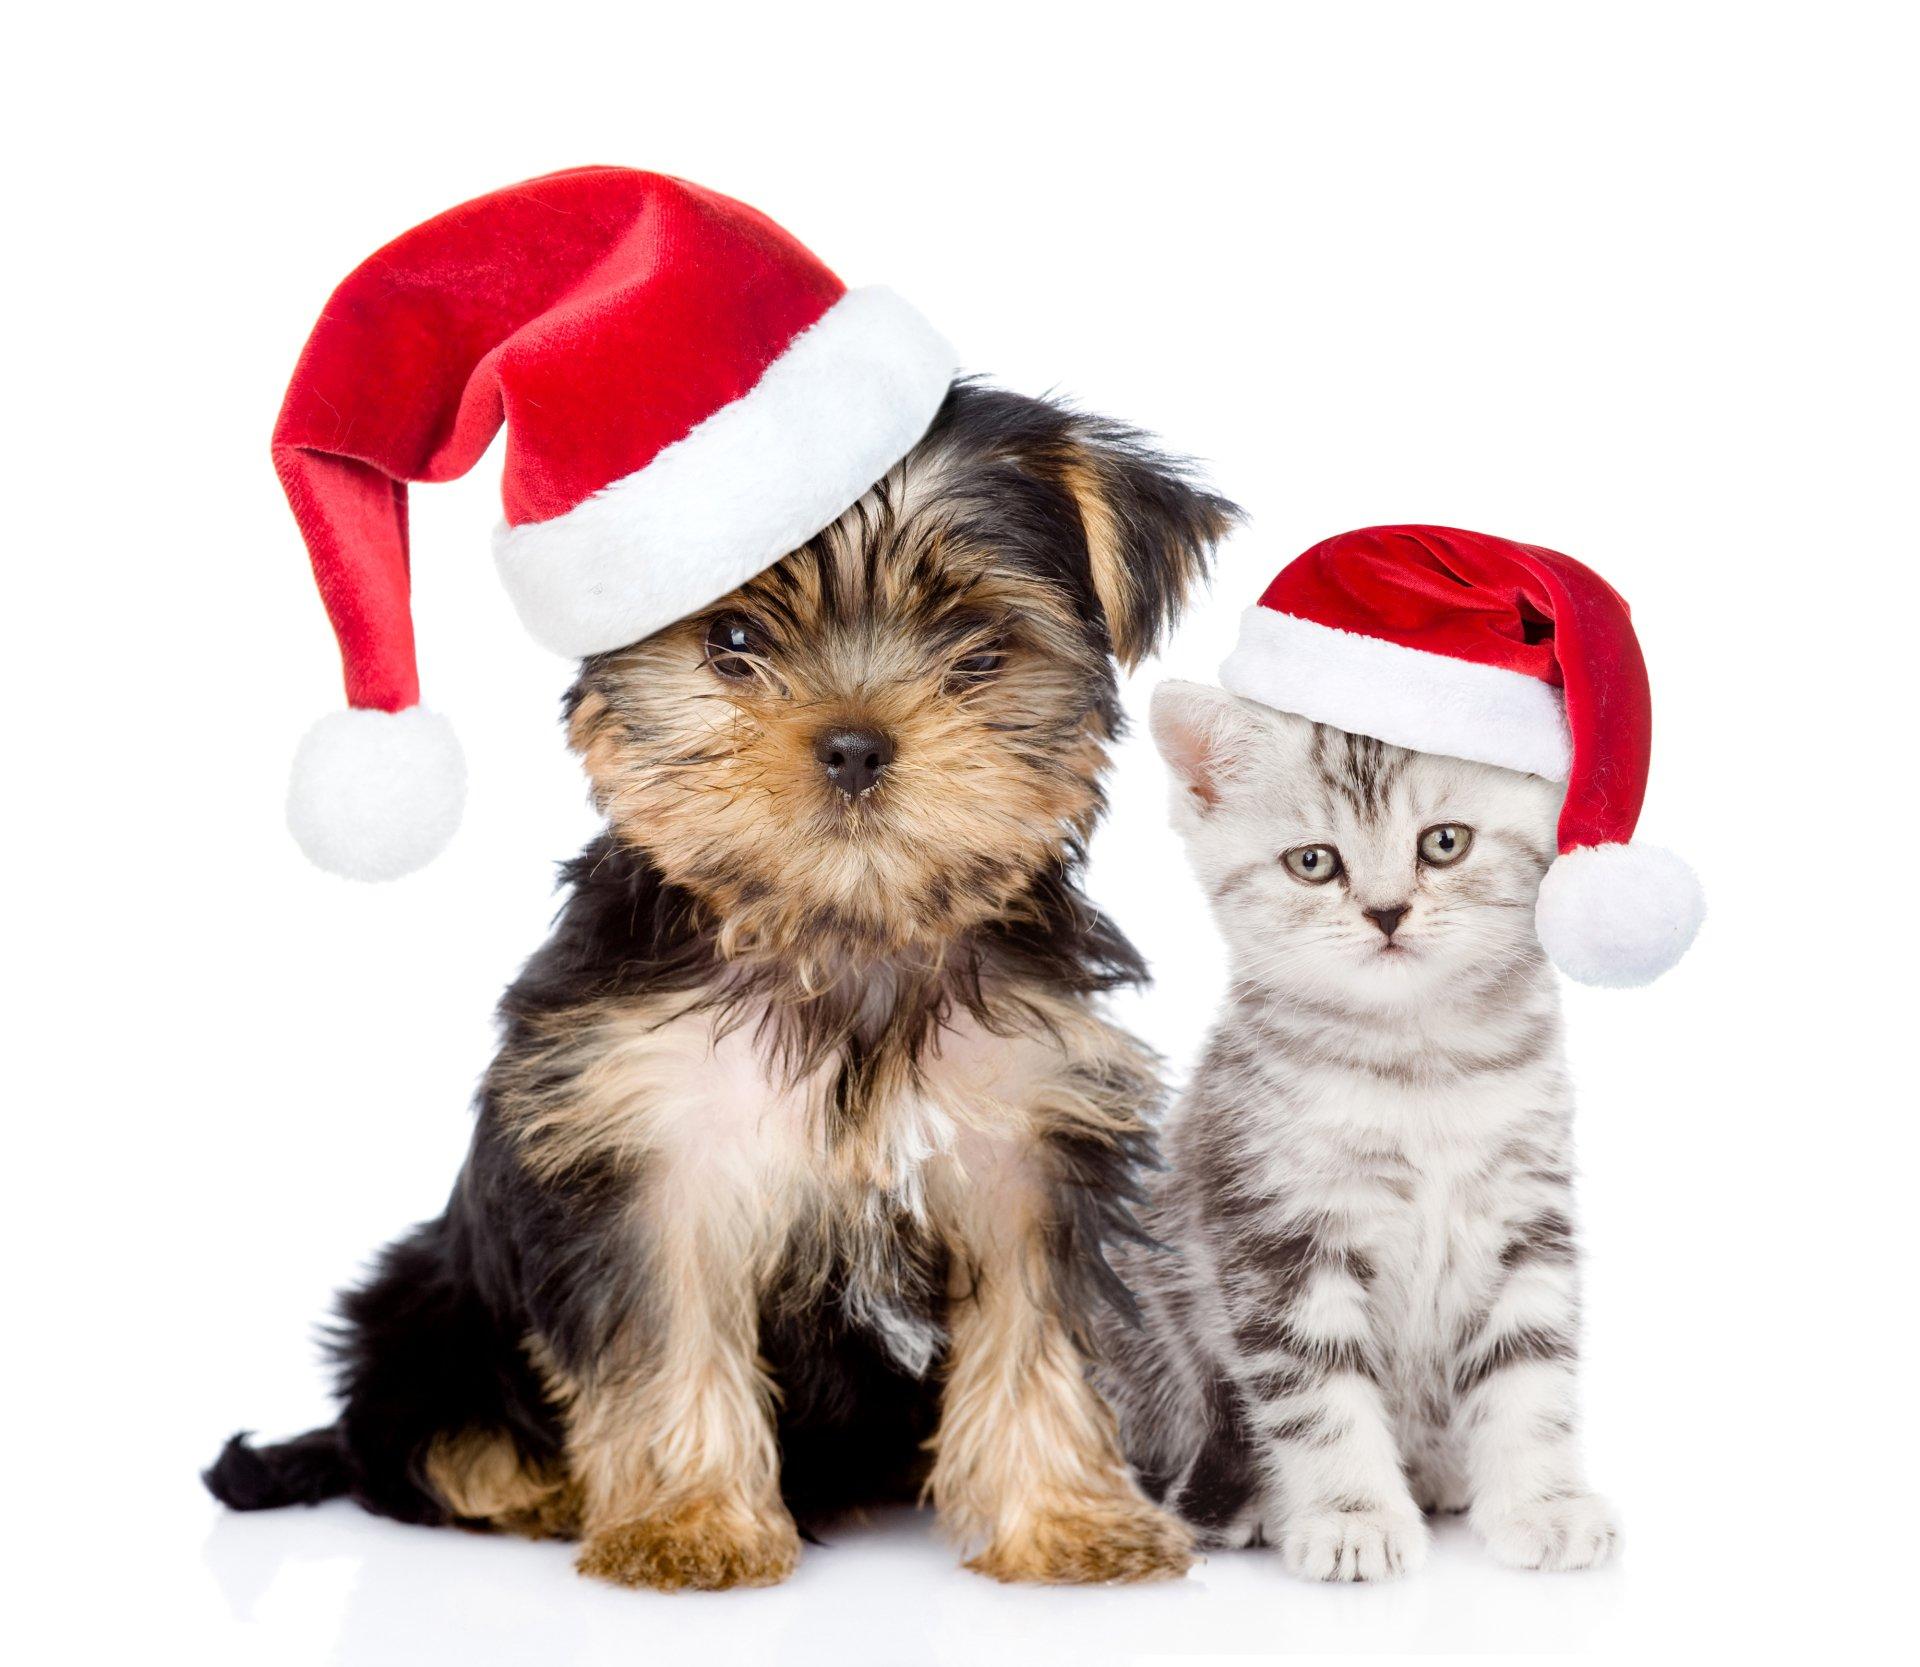 Puppy And Kitten With Santa Hats 4k Ultra HD Wallpaper